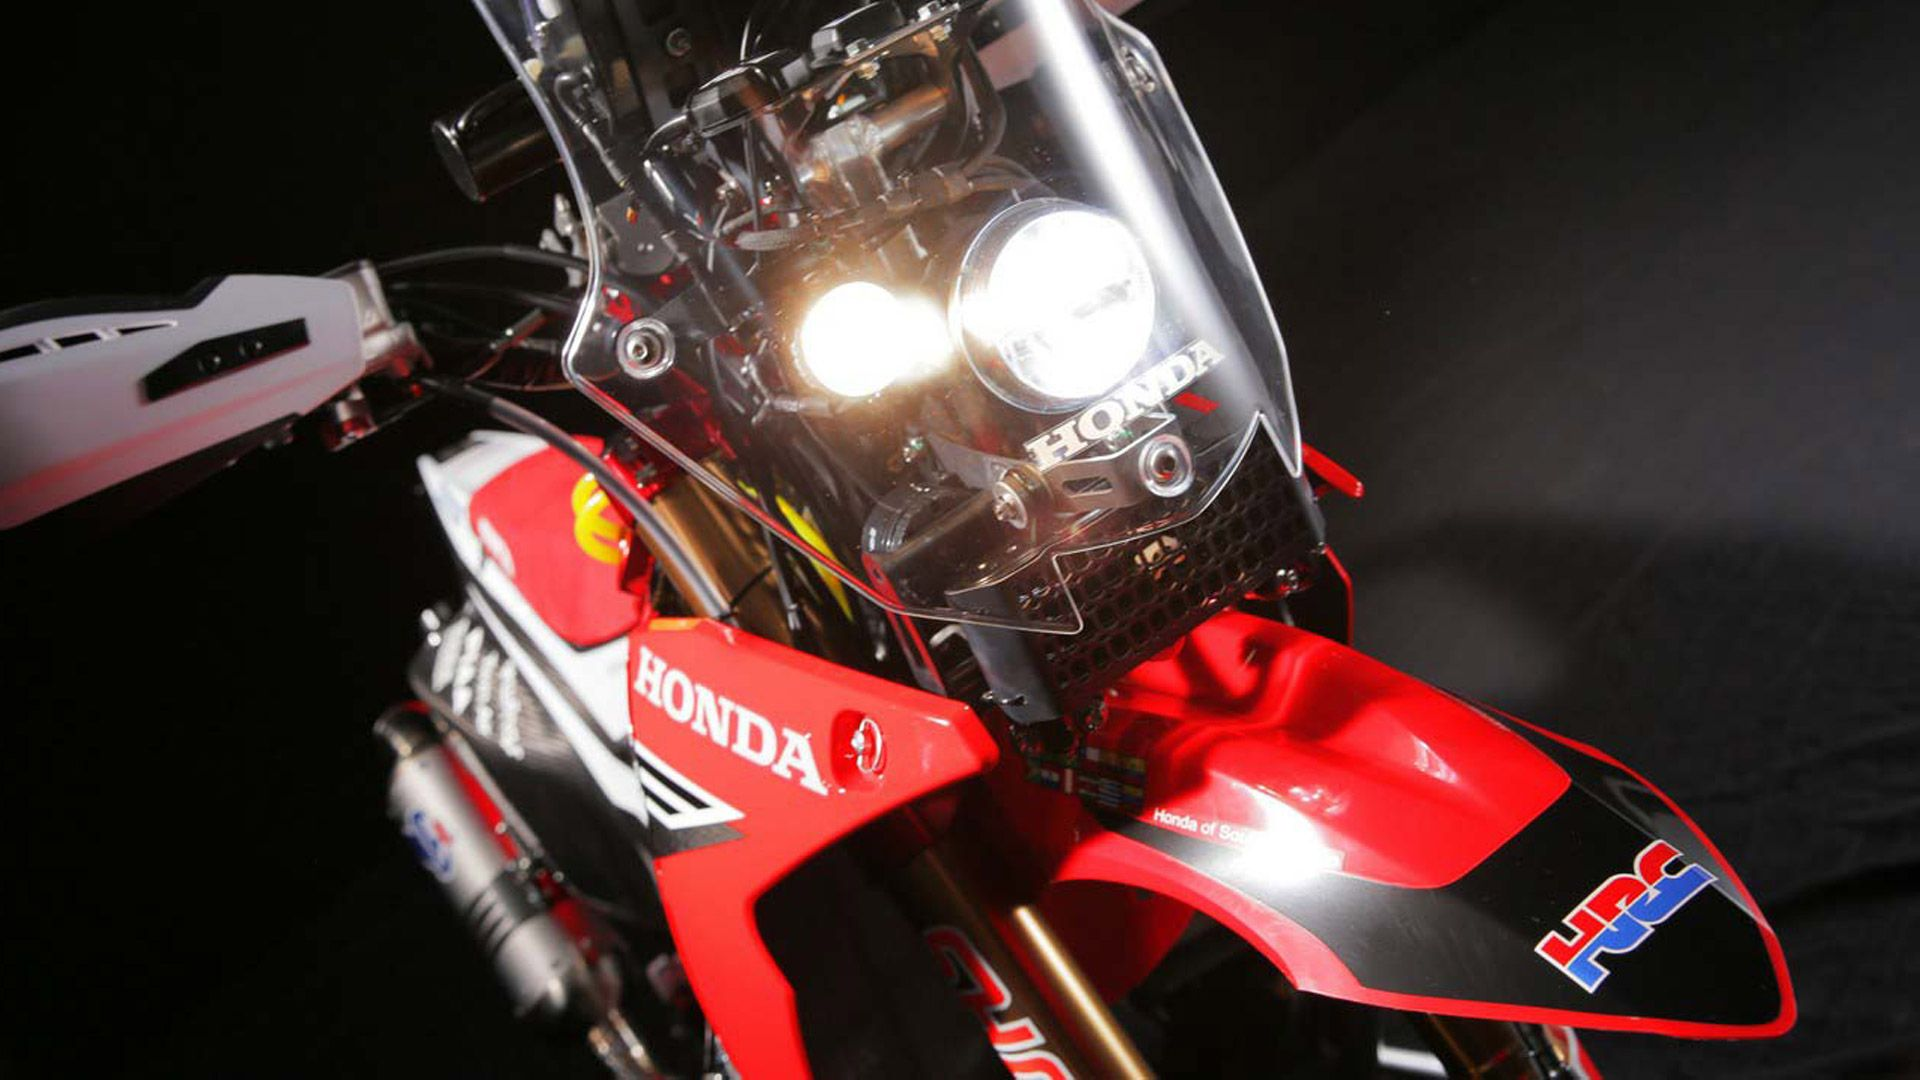 Dual Hand Lamp 2014 Honda Crf450 Rally 2014 Honda Crf450 Rally